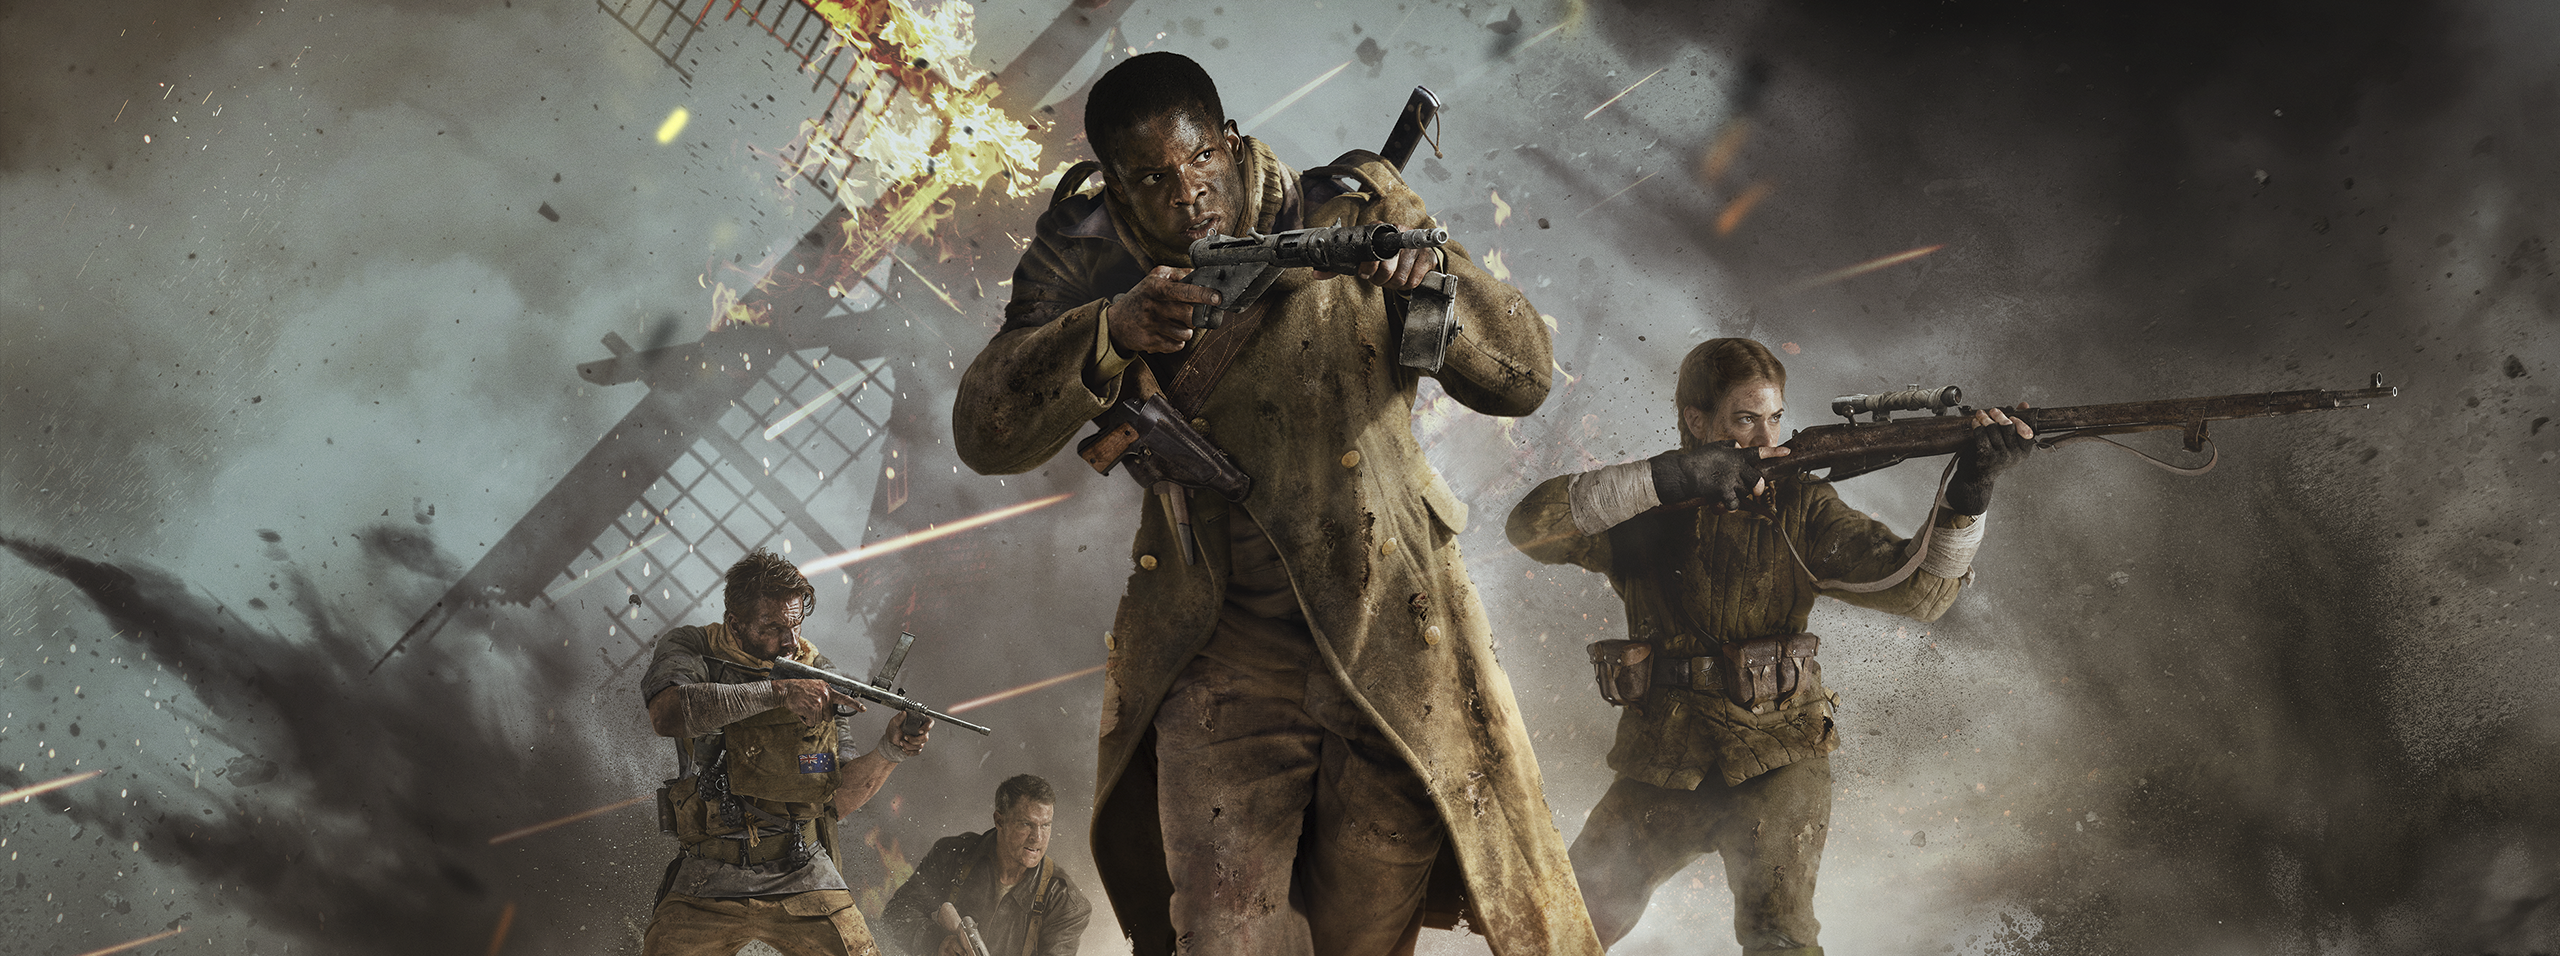 Call of Duty: Vanguard - Open Beta Key Art